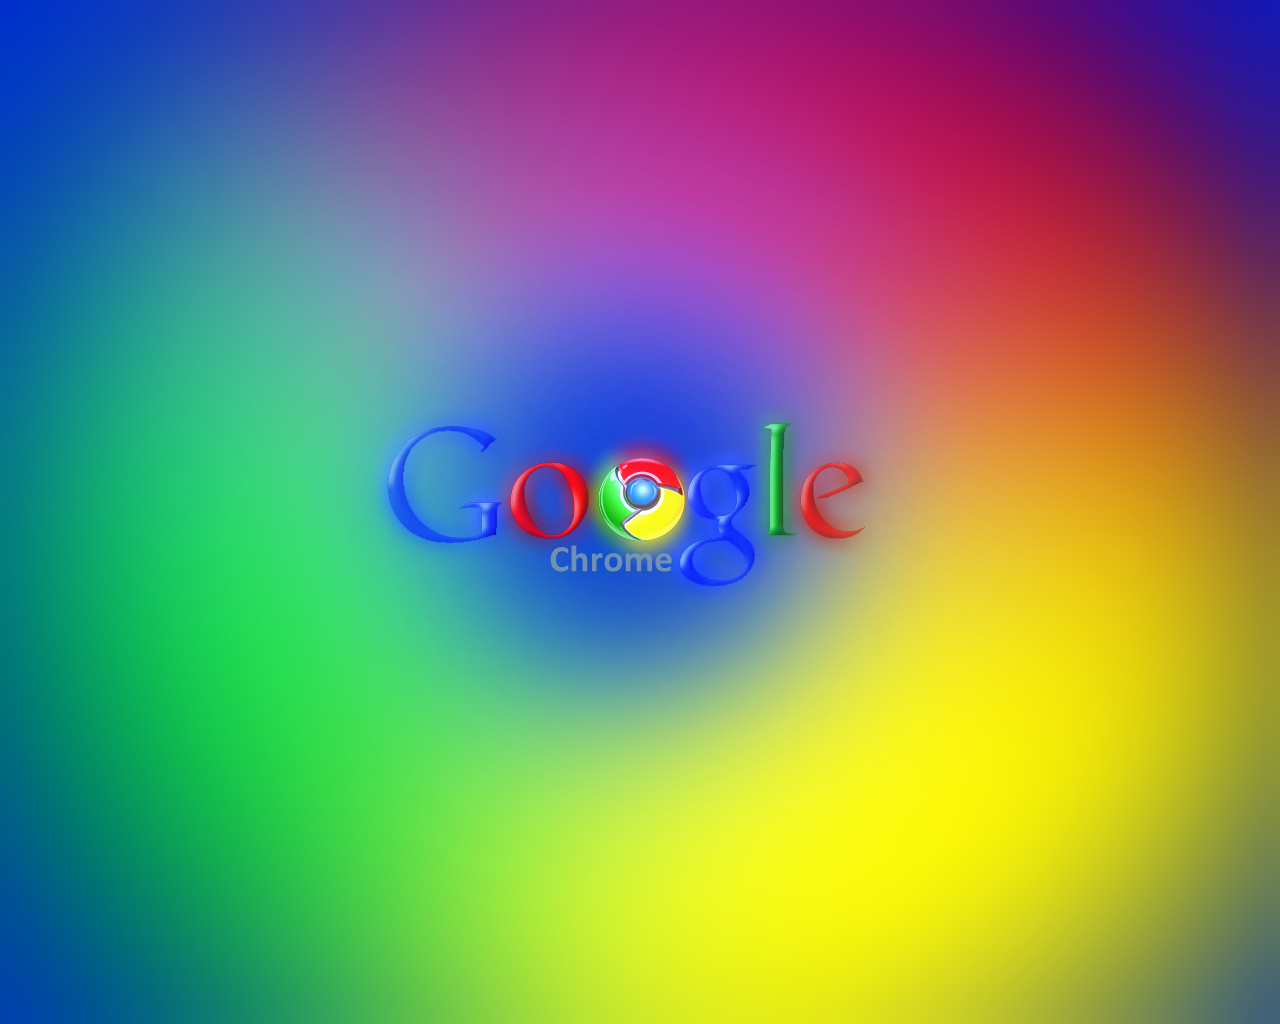 hd desktop background Google Desktop Wallpaper 1280x1024